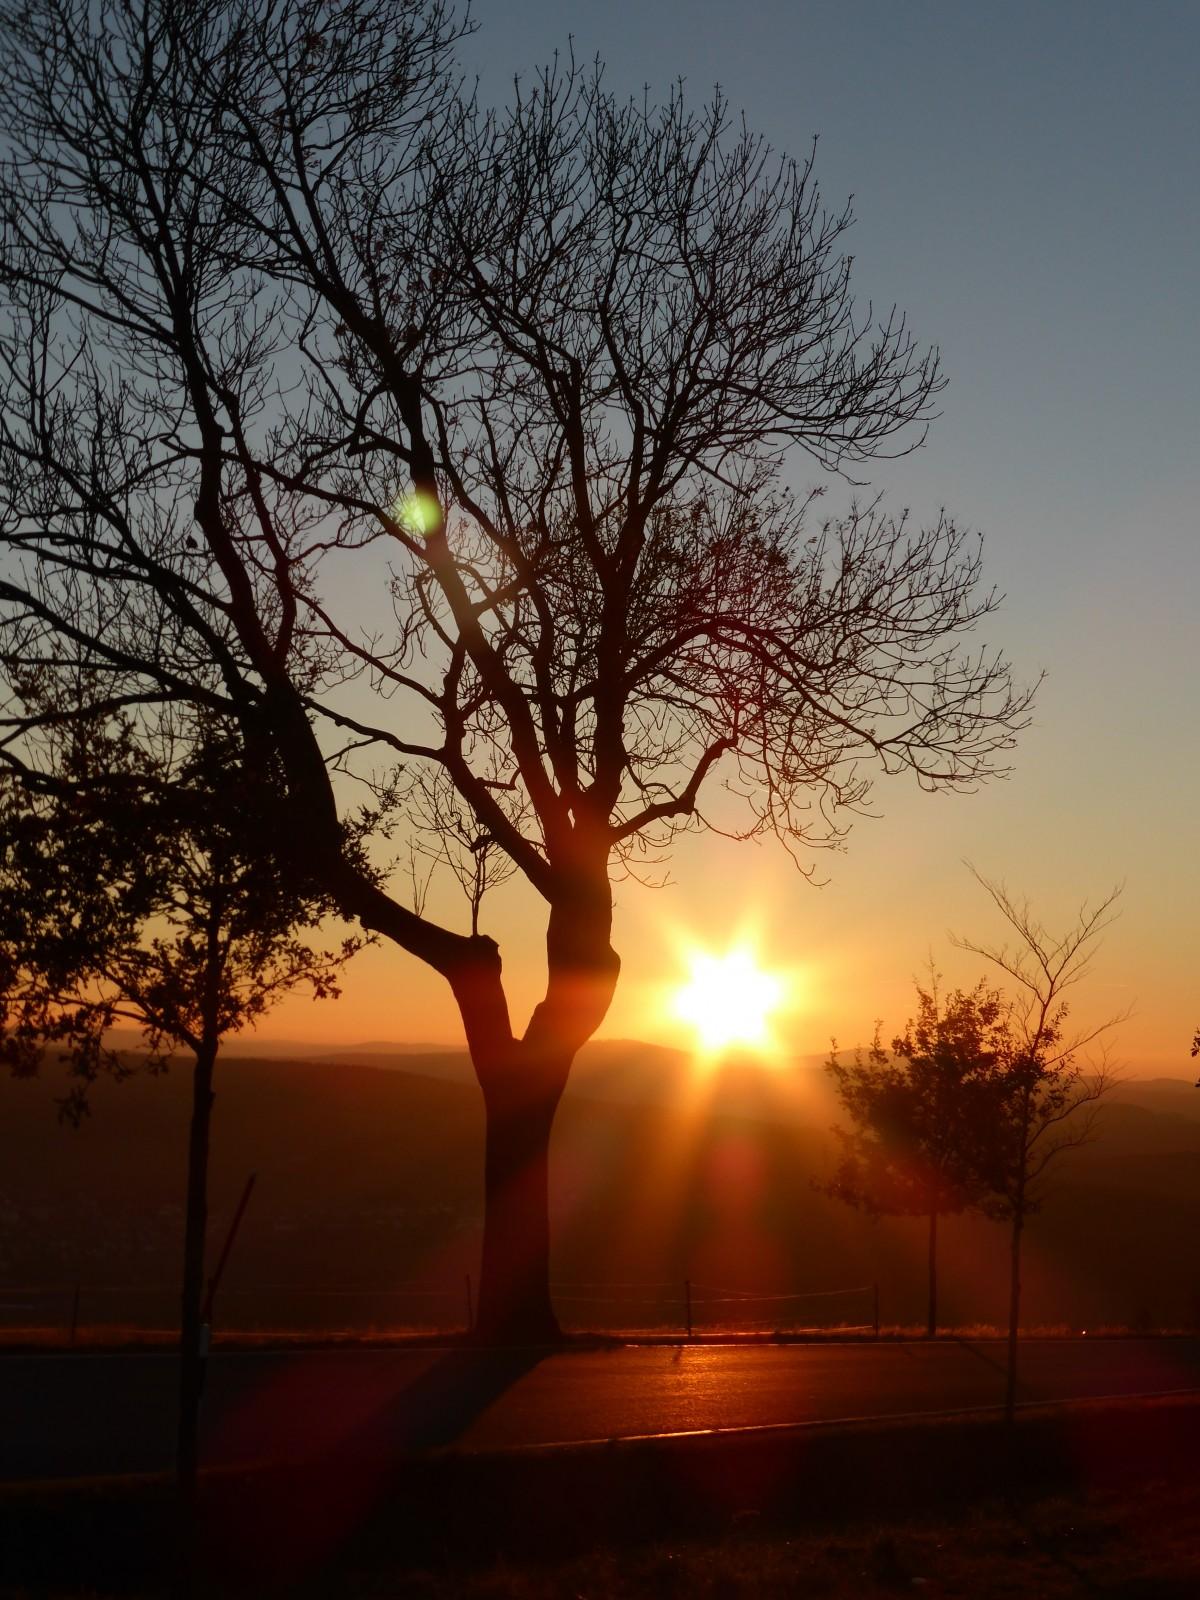 Sunlight Morning Dawn Refraction Dusk Evening Orange Shadow Romance Aesthetic Clouds Mood Abendstimmung Afterglow Atmospheric Phenomenon